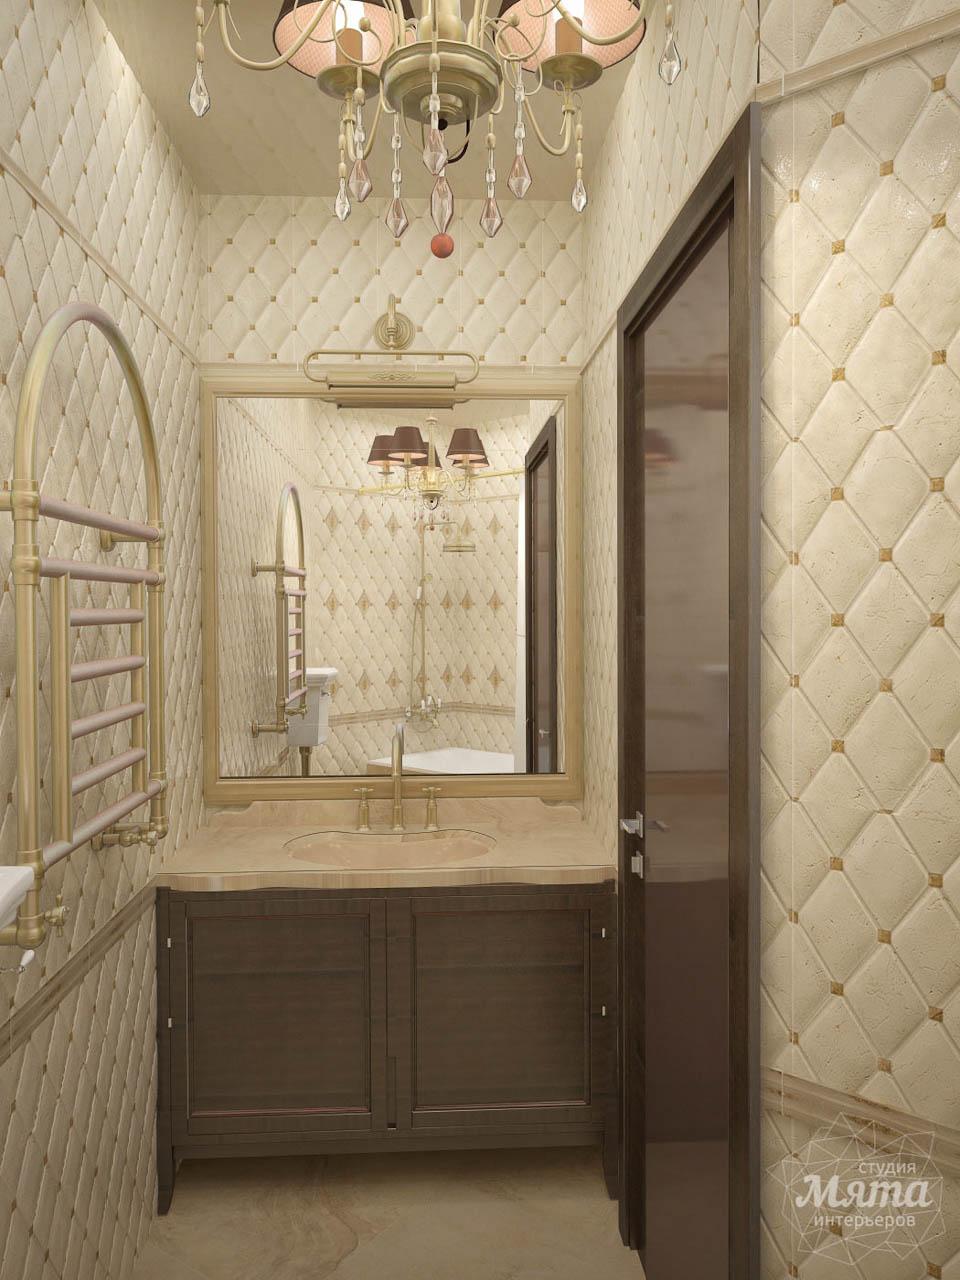 Дизайн интерьера и ремонт трехкомнатной квартиры по ул. 8 Марта 190 img244935769